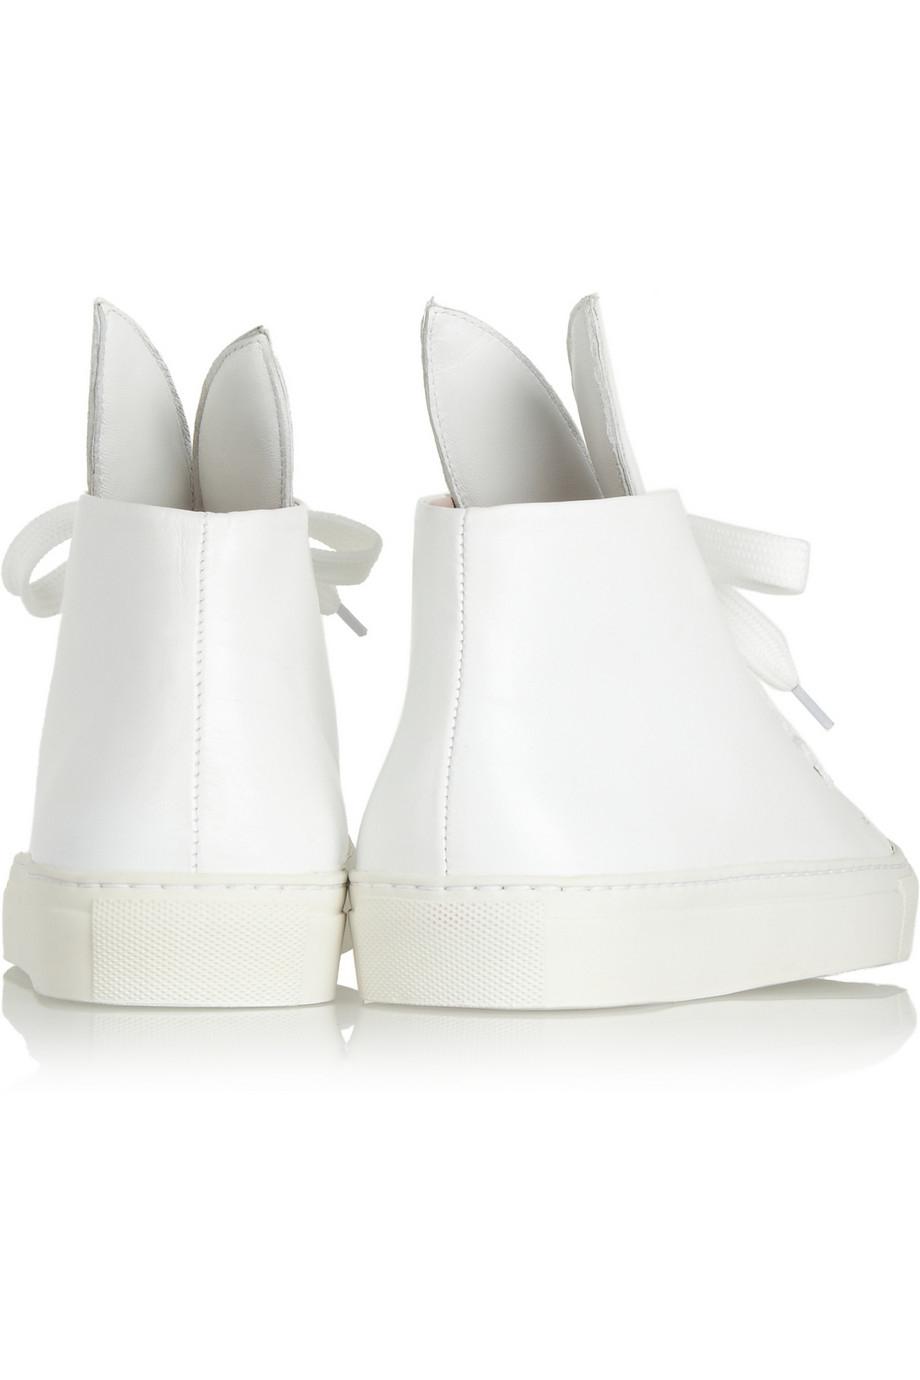 Minna Parikka Bunny Leather Hightop Sneakers in White